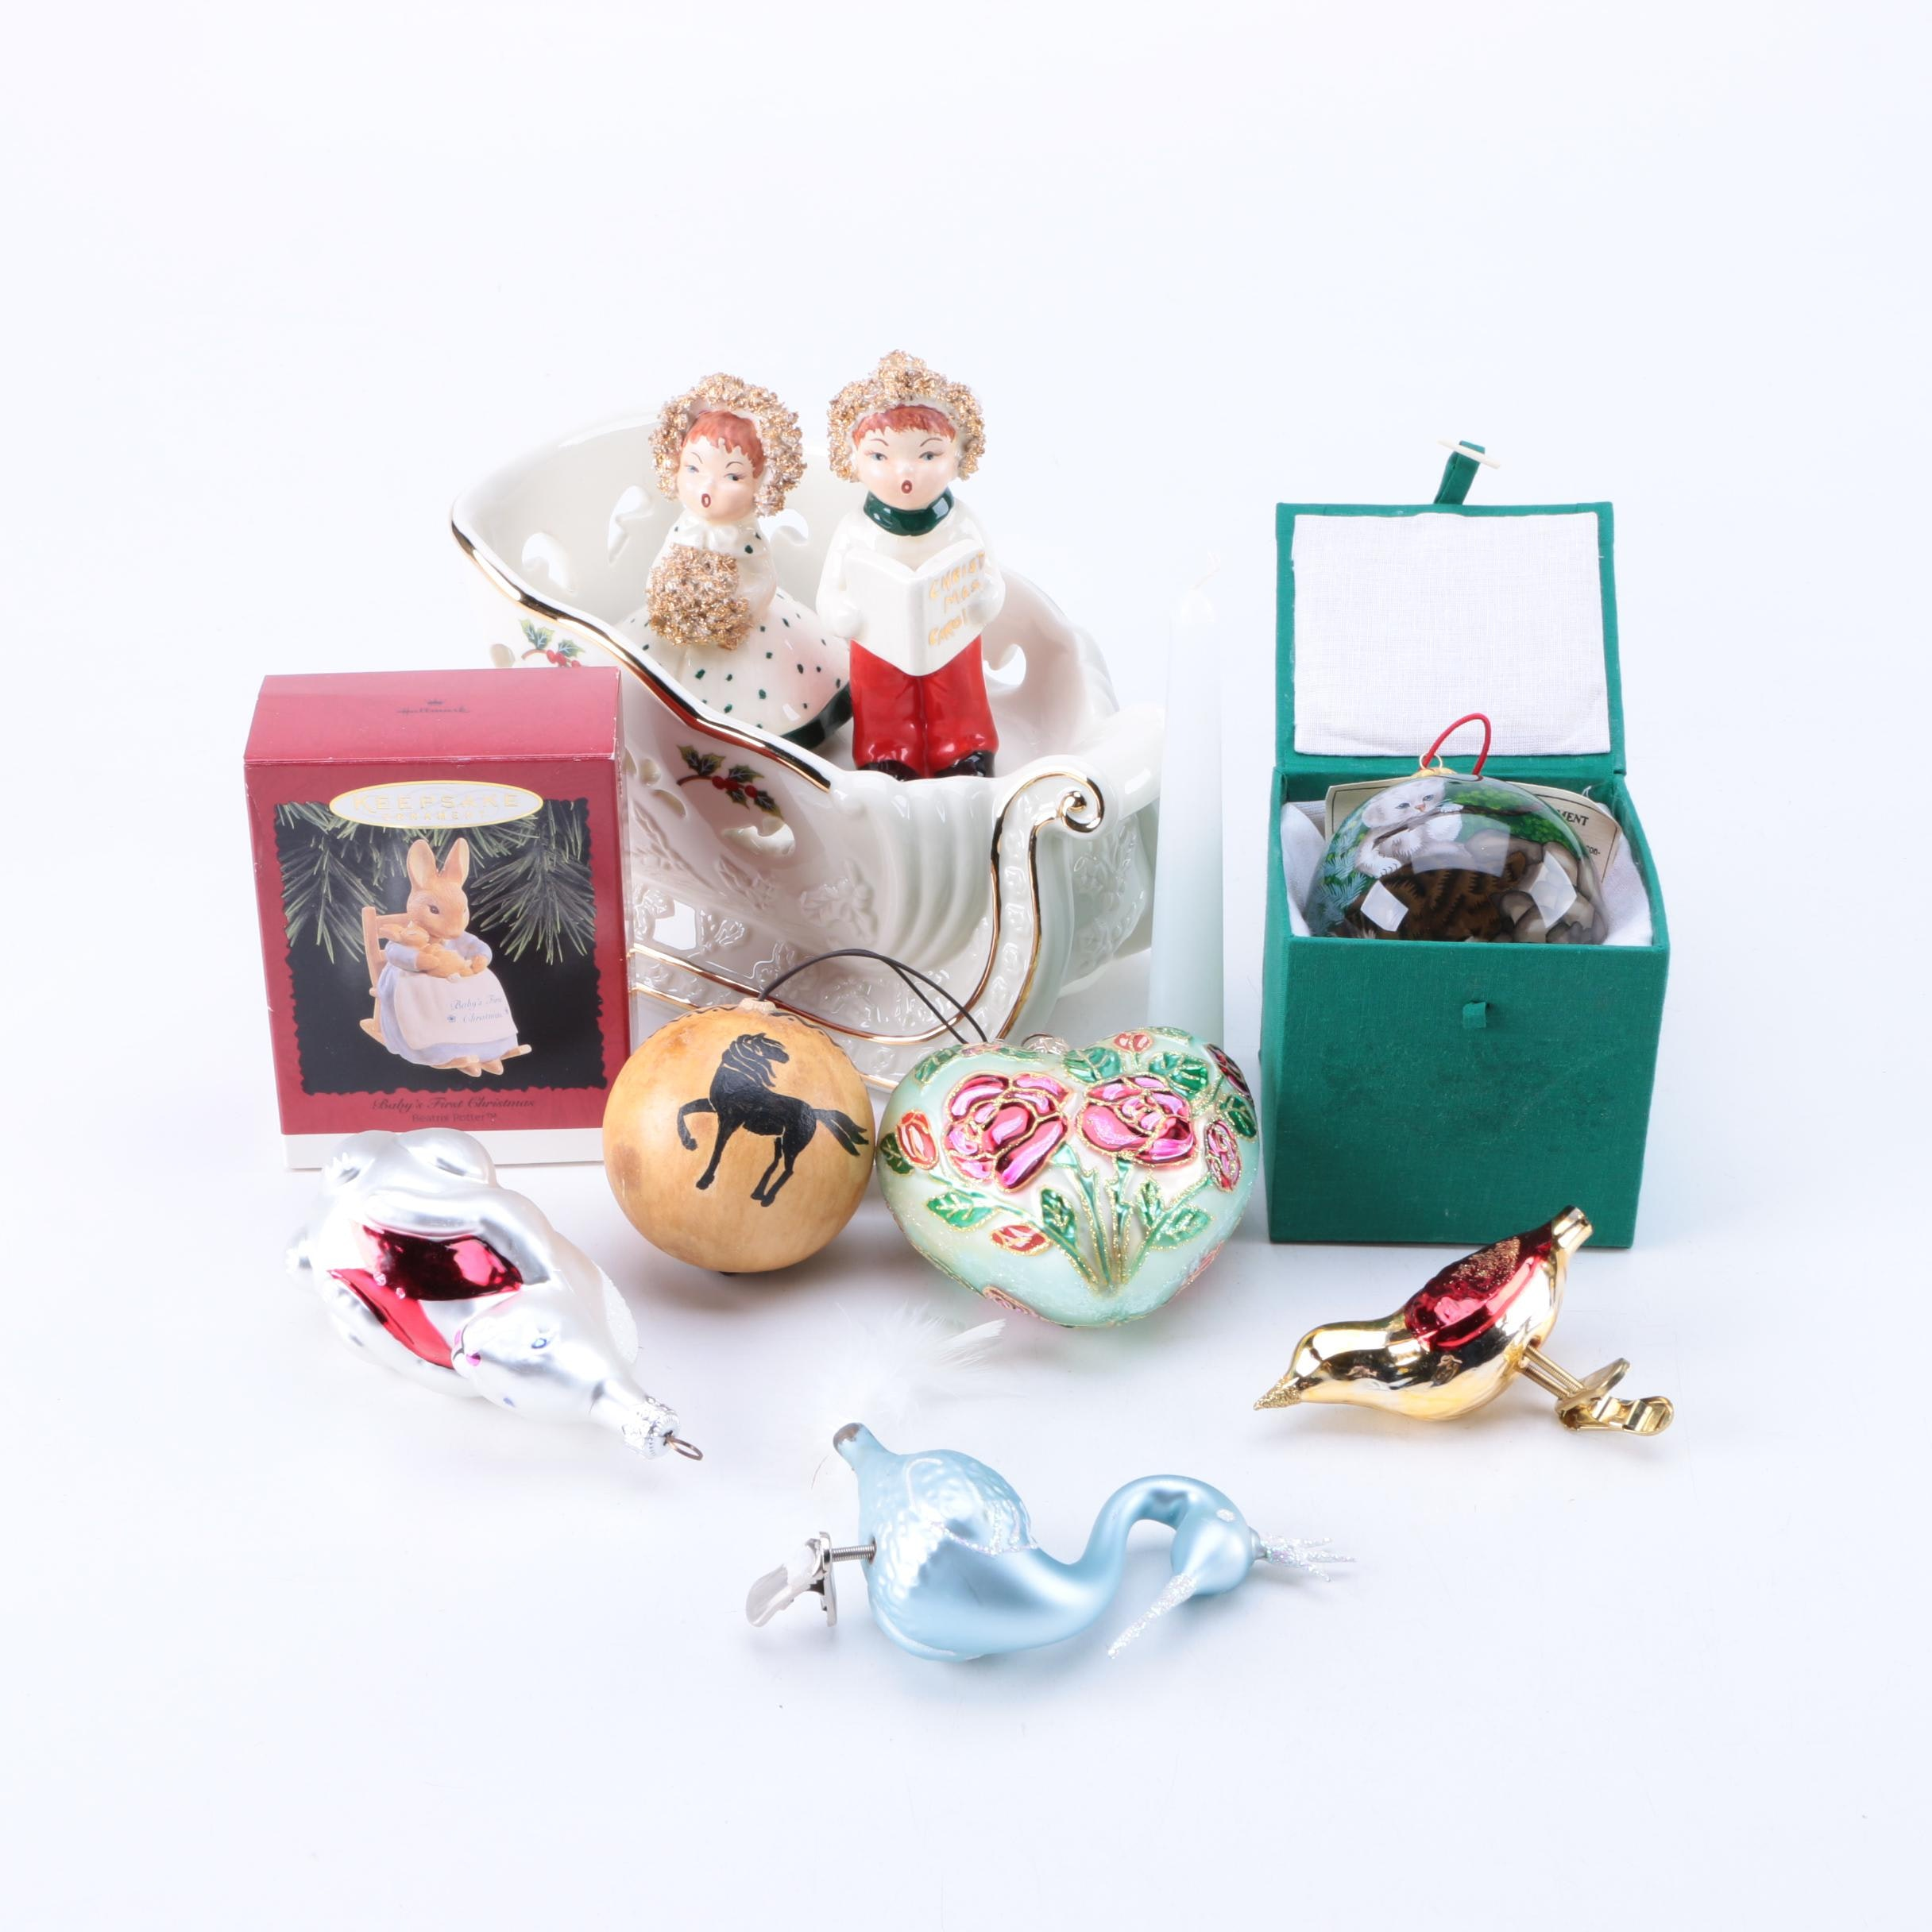 Christmas Decor Assortment